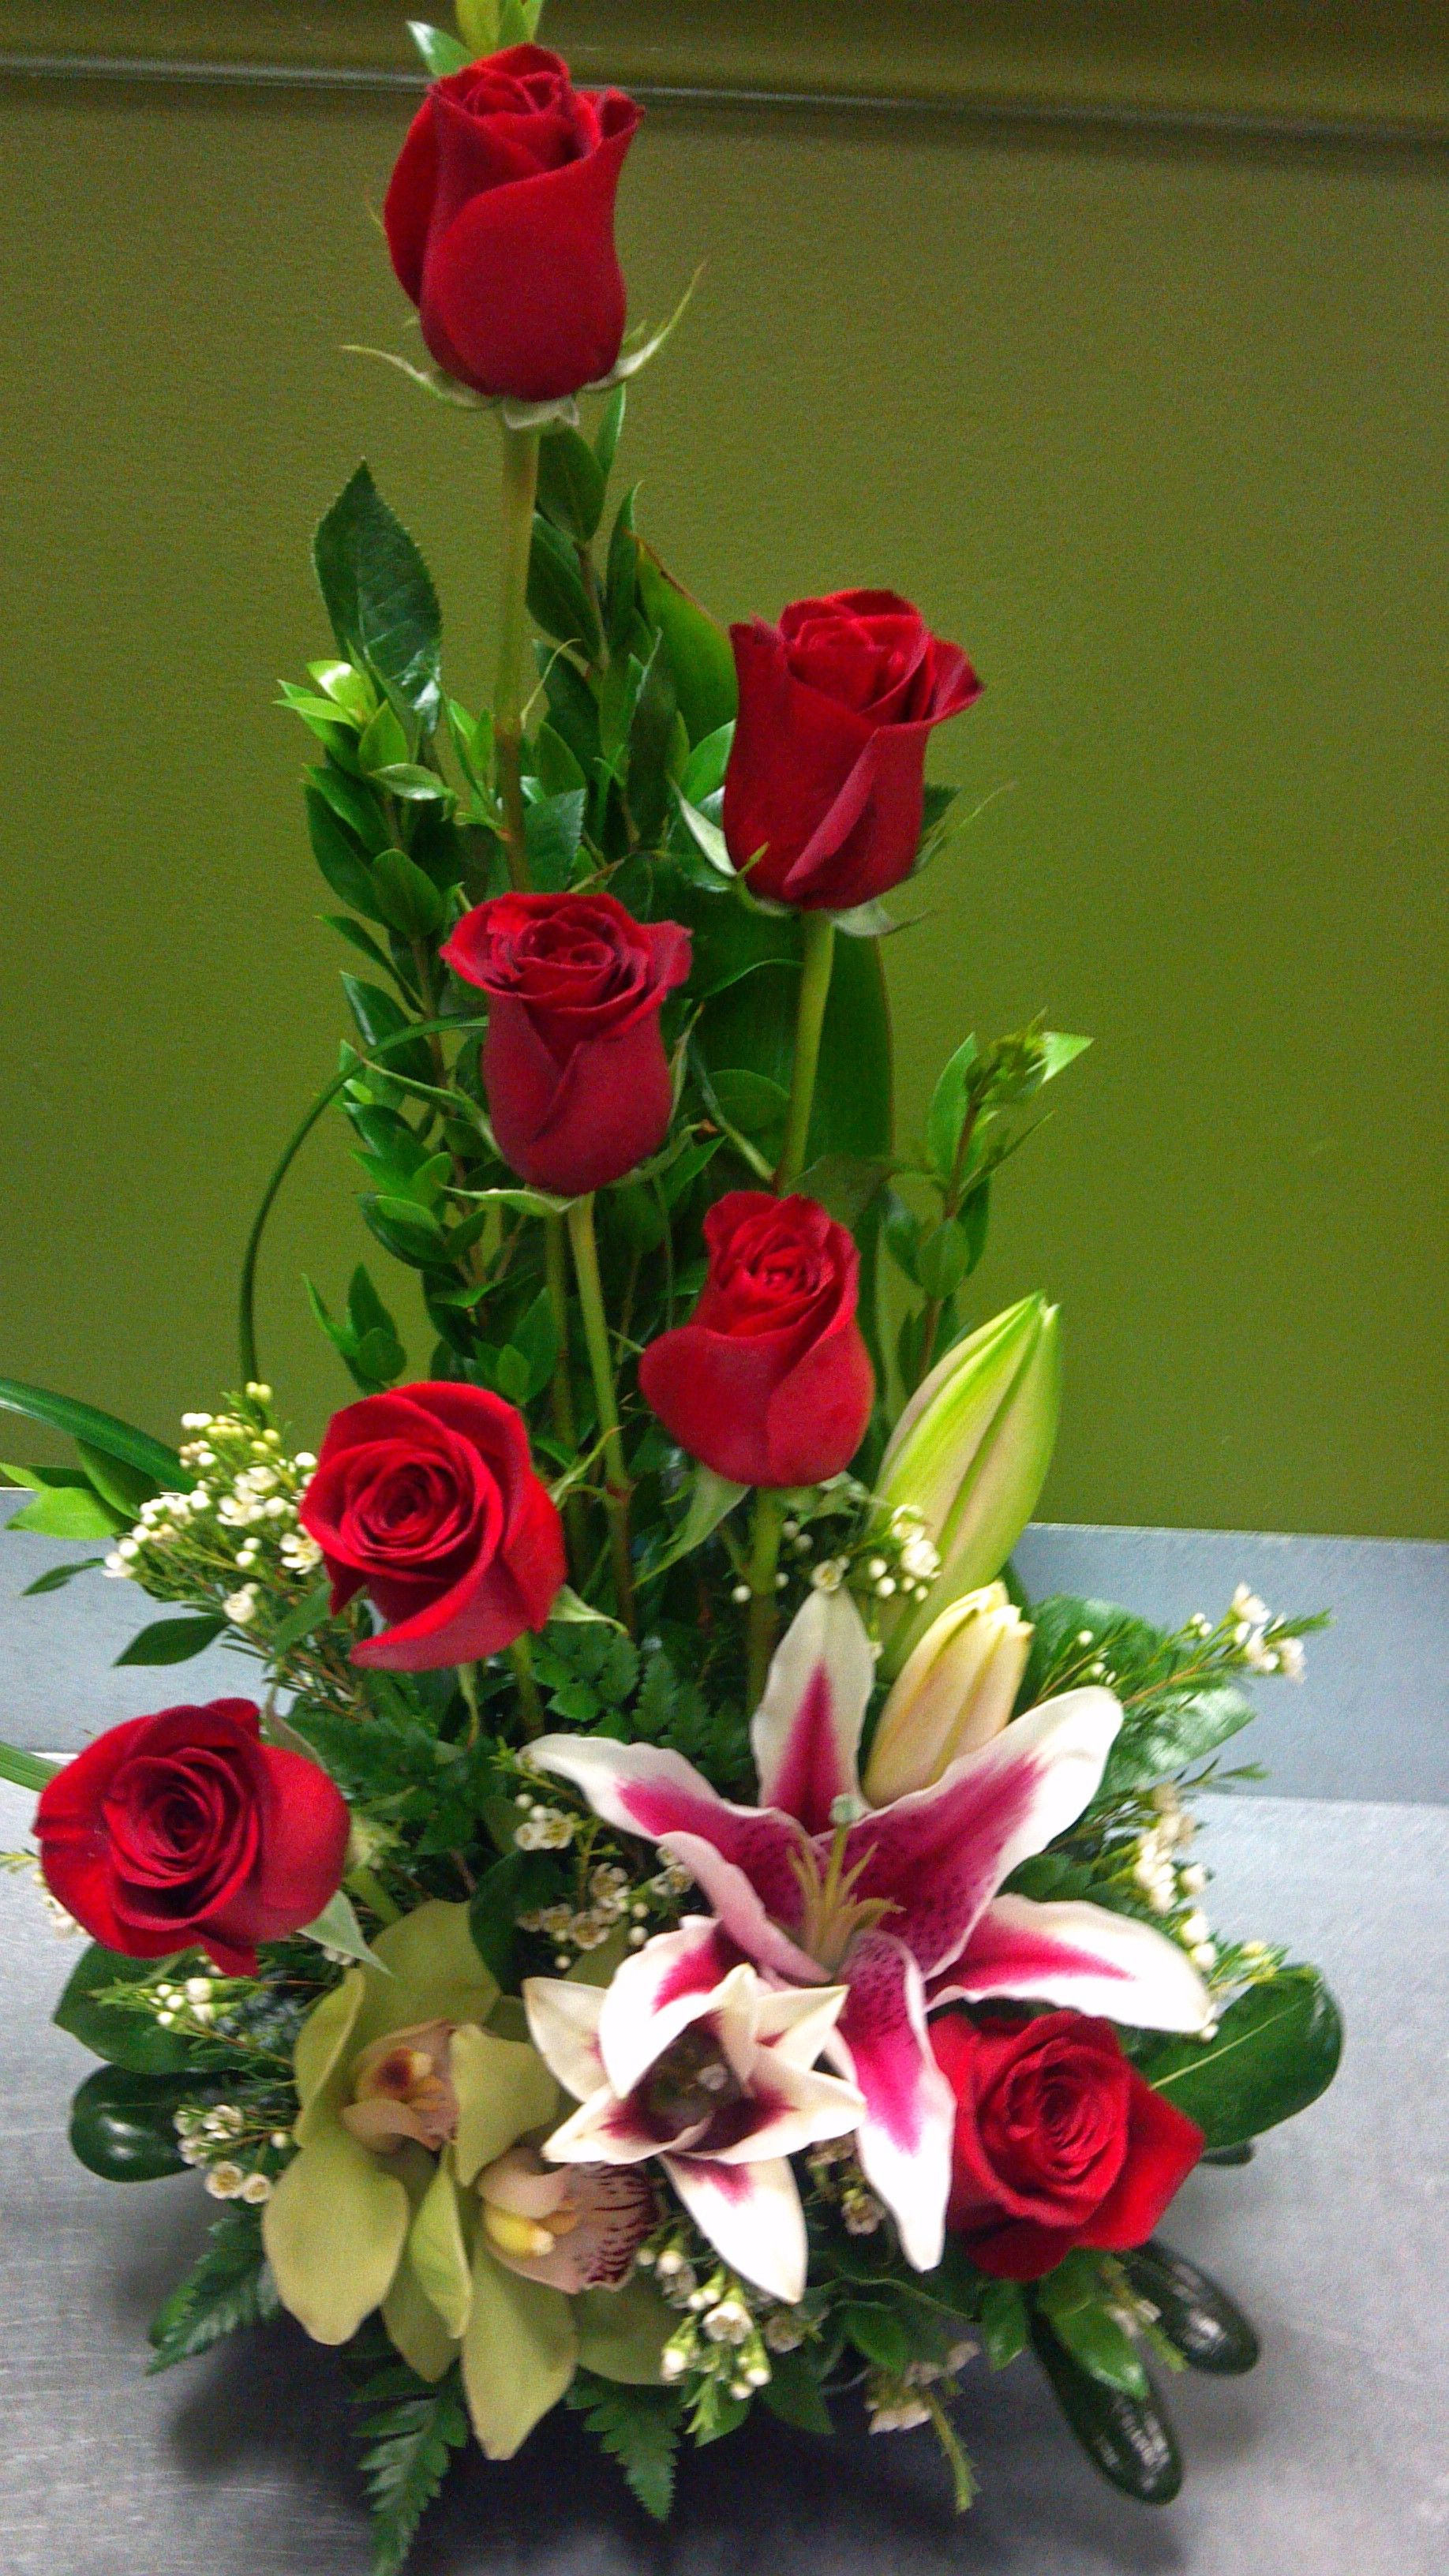 7 red roses Arreglosflorales Arreglos florales